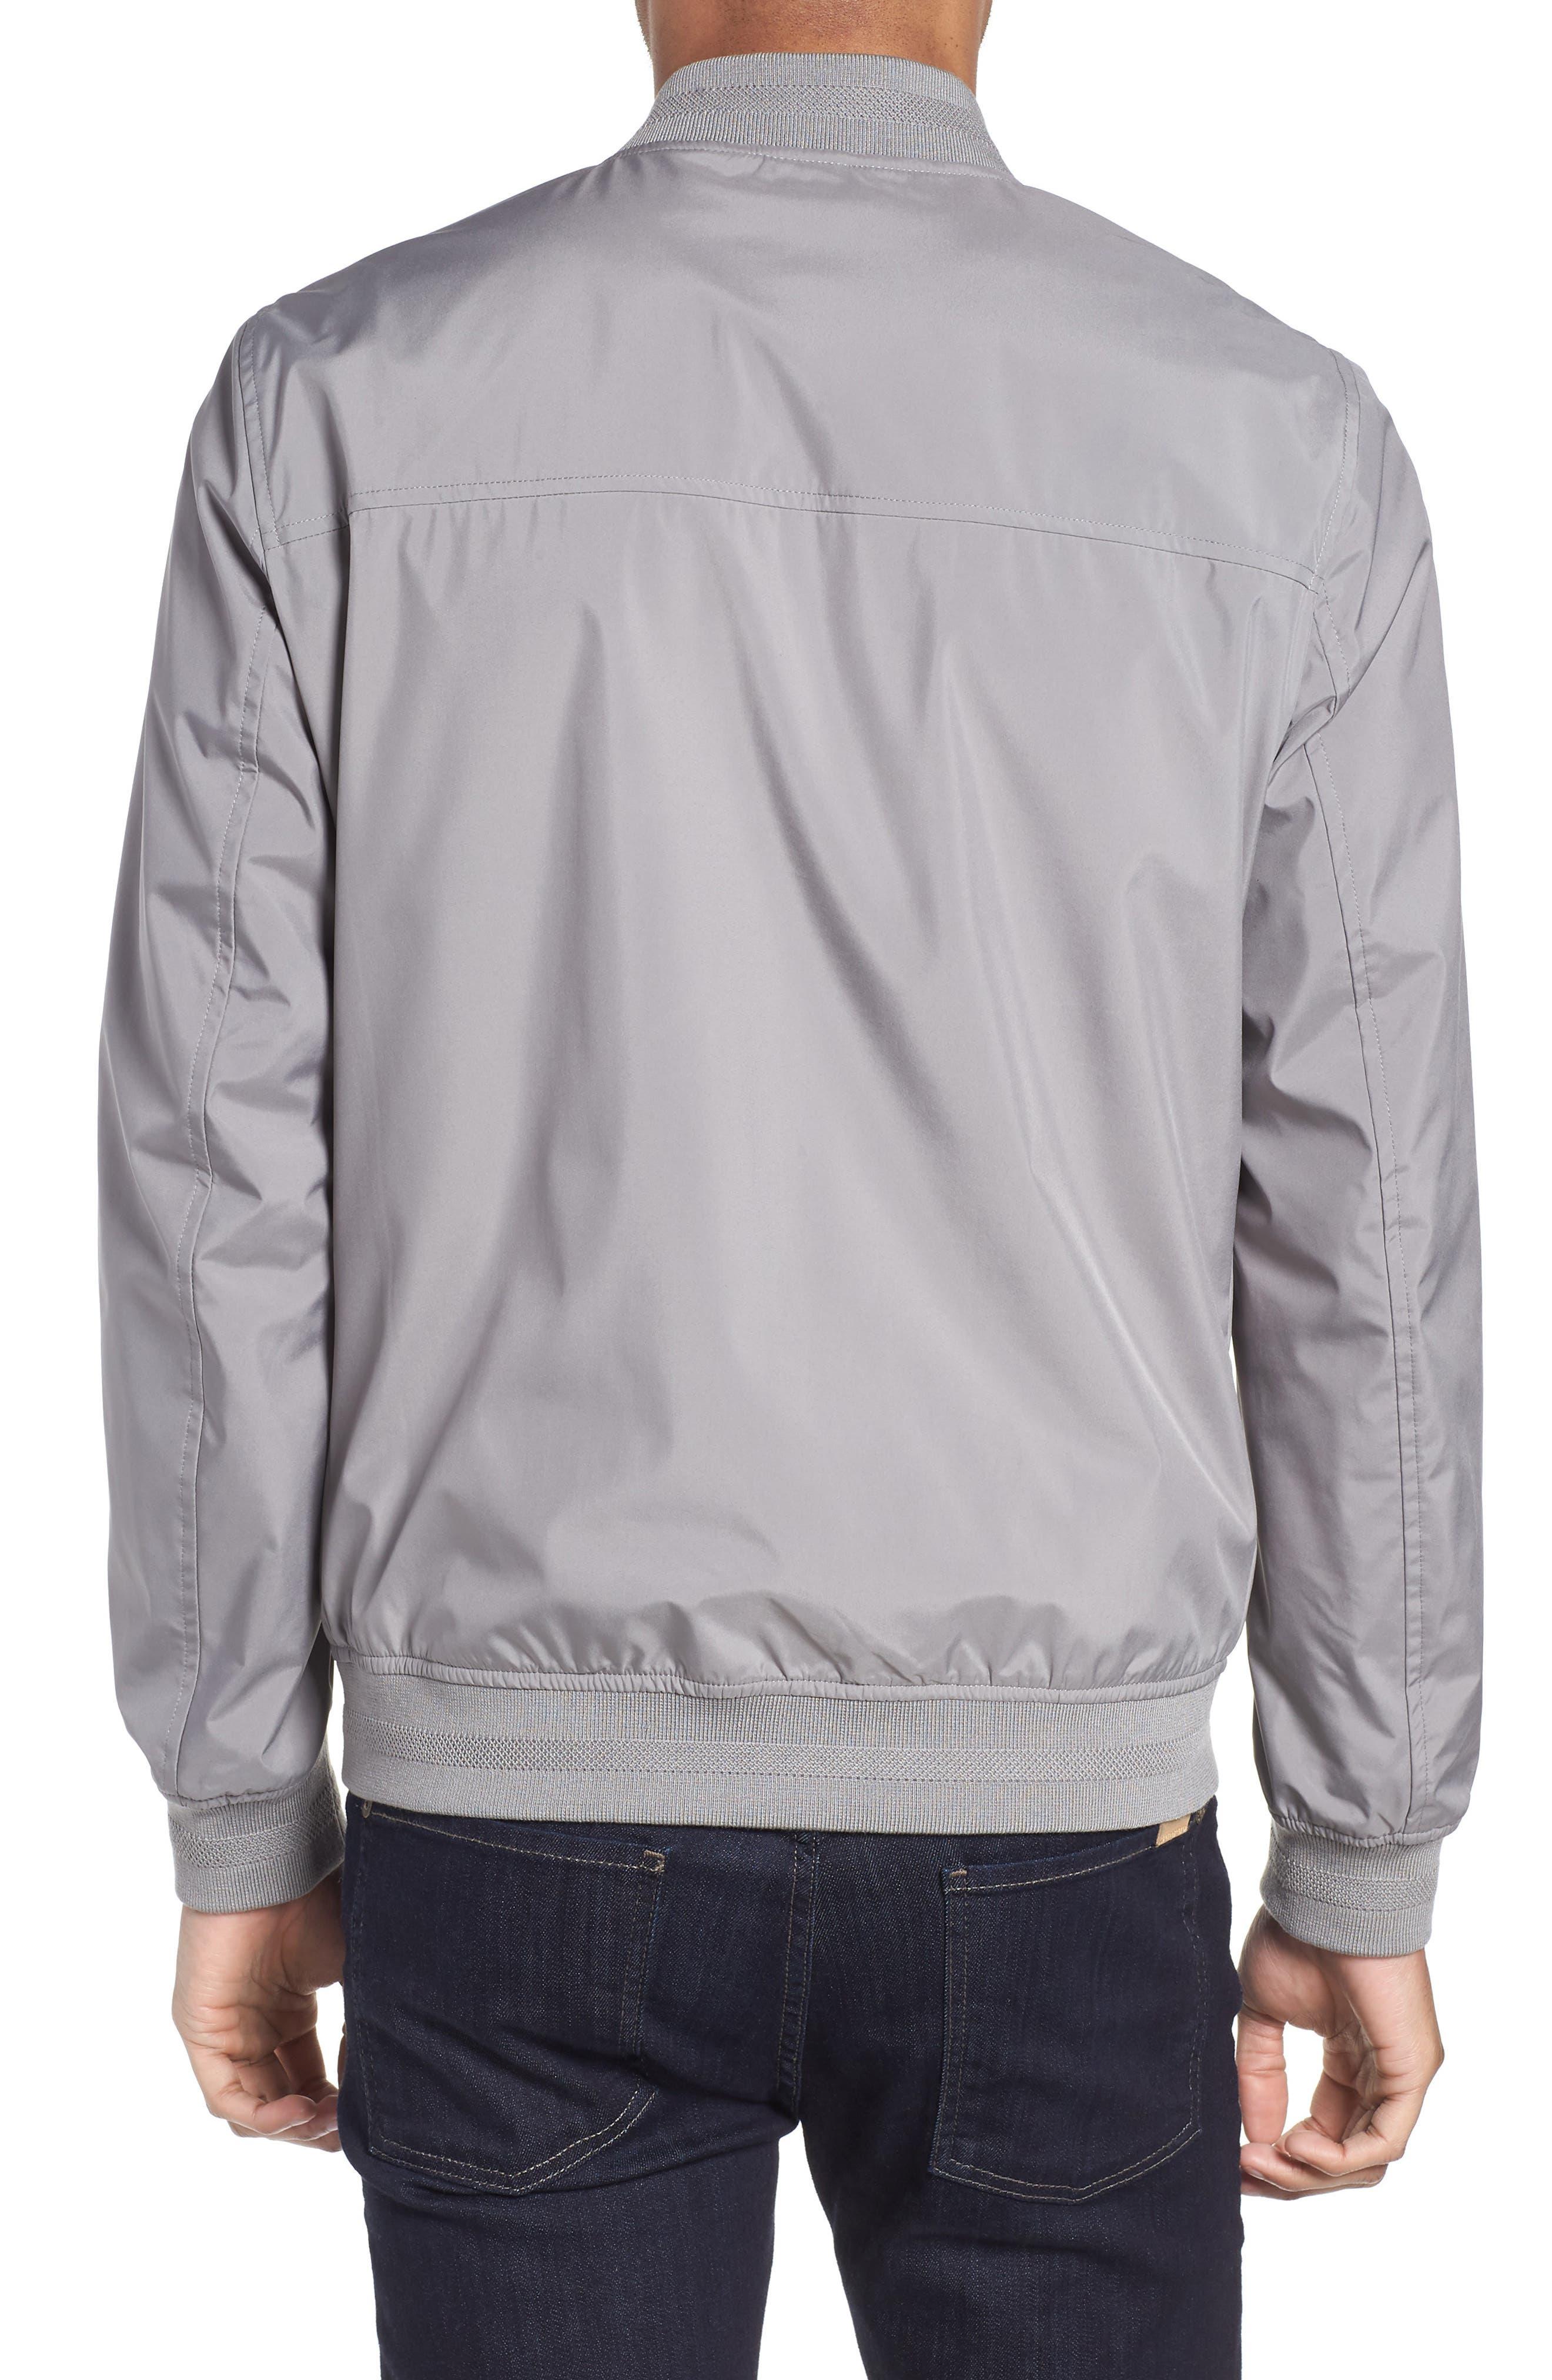 Ohtatt Bomber Jacket,                             Alternate thumbnail 2, color,                             Grey